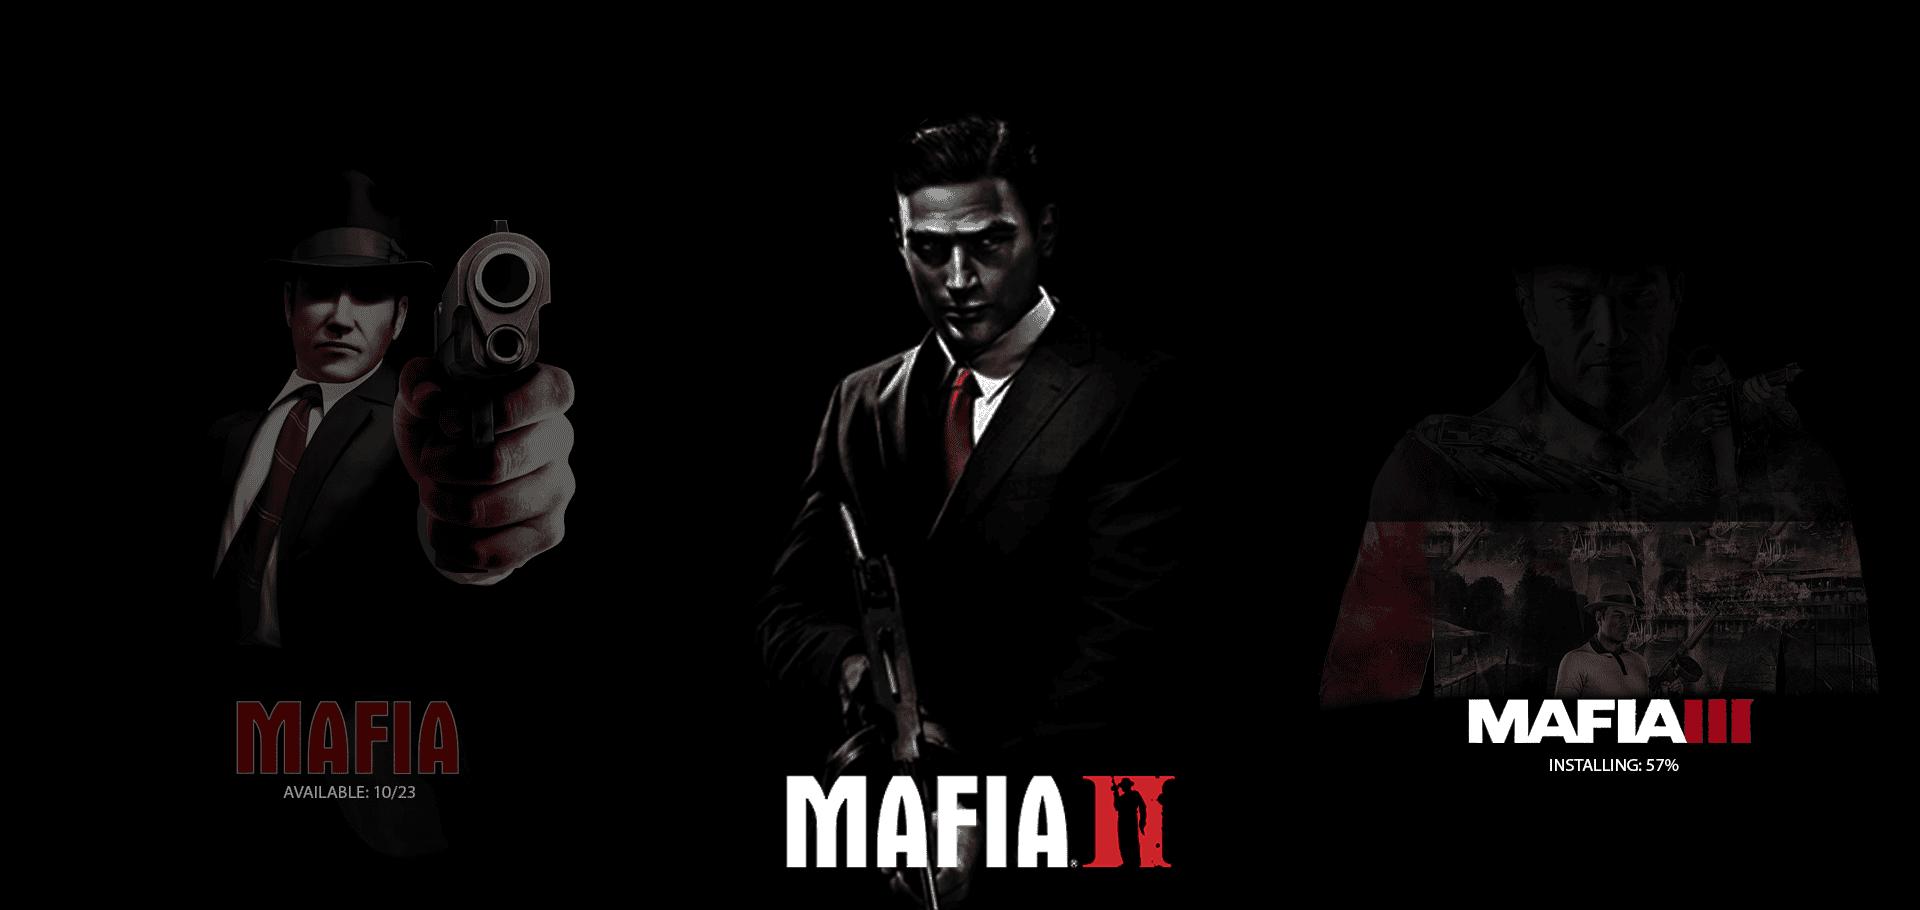 Se filtran numerosos detalles importantes sobre Mafia Definitive Edition